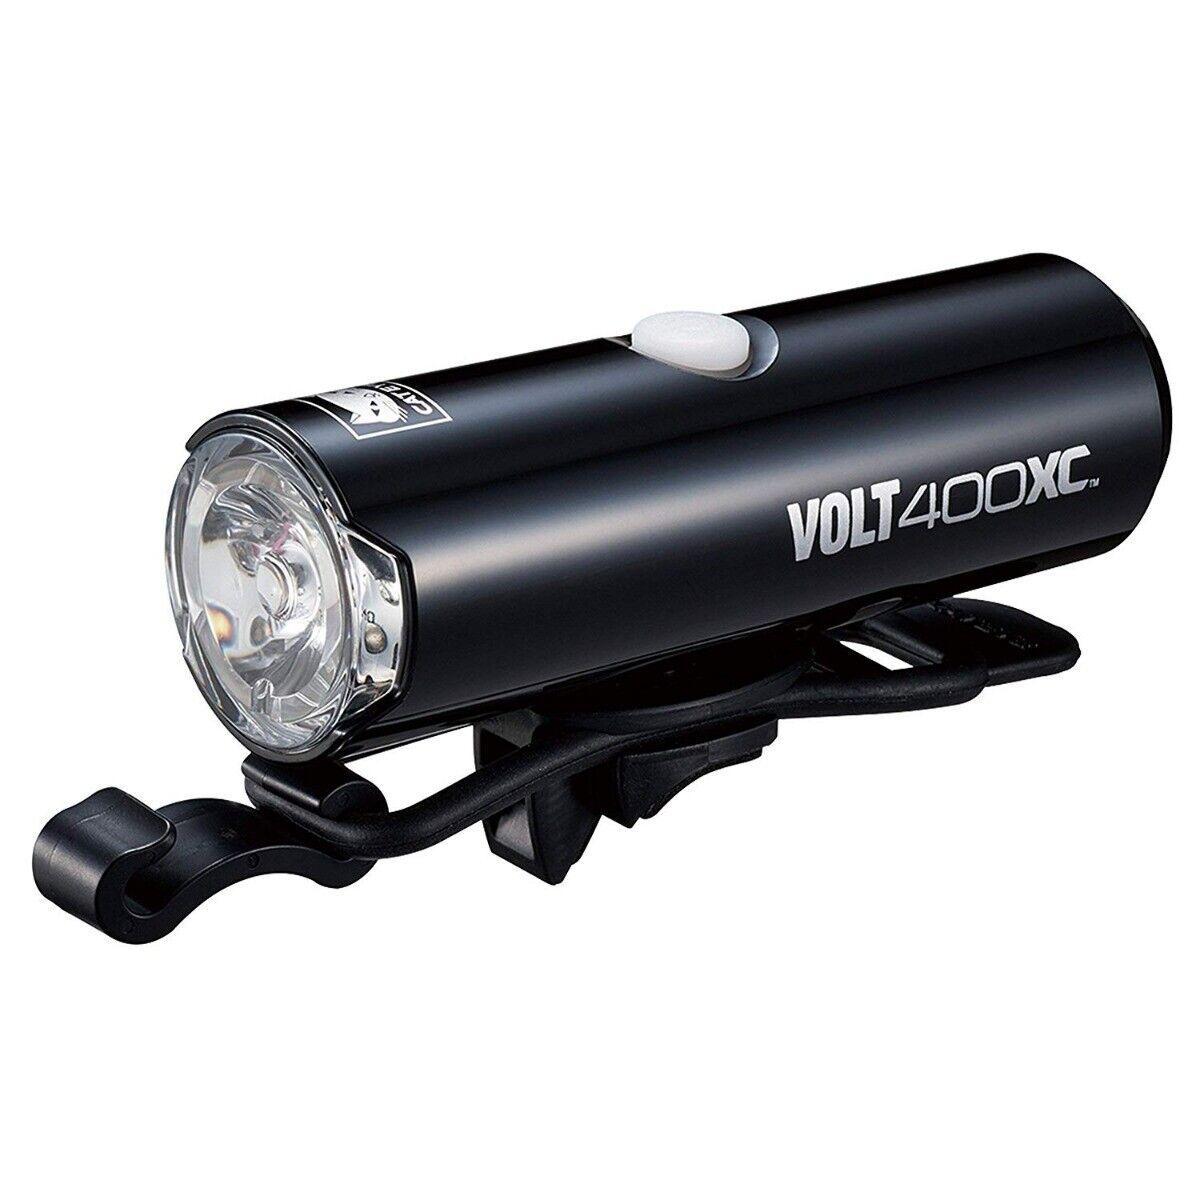 Cateye HLEL07 VOLT400XC 400 Luuomini UsbRechargeable biciclettatte Phare Neuf